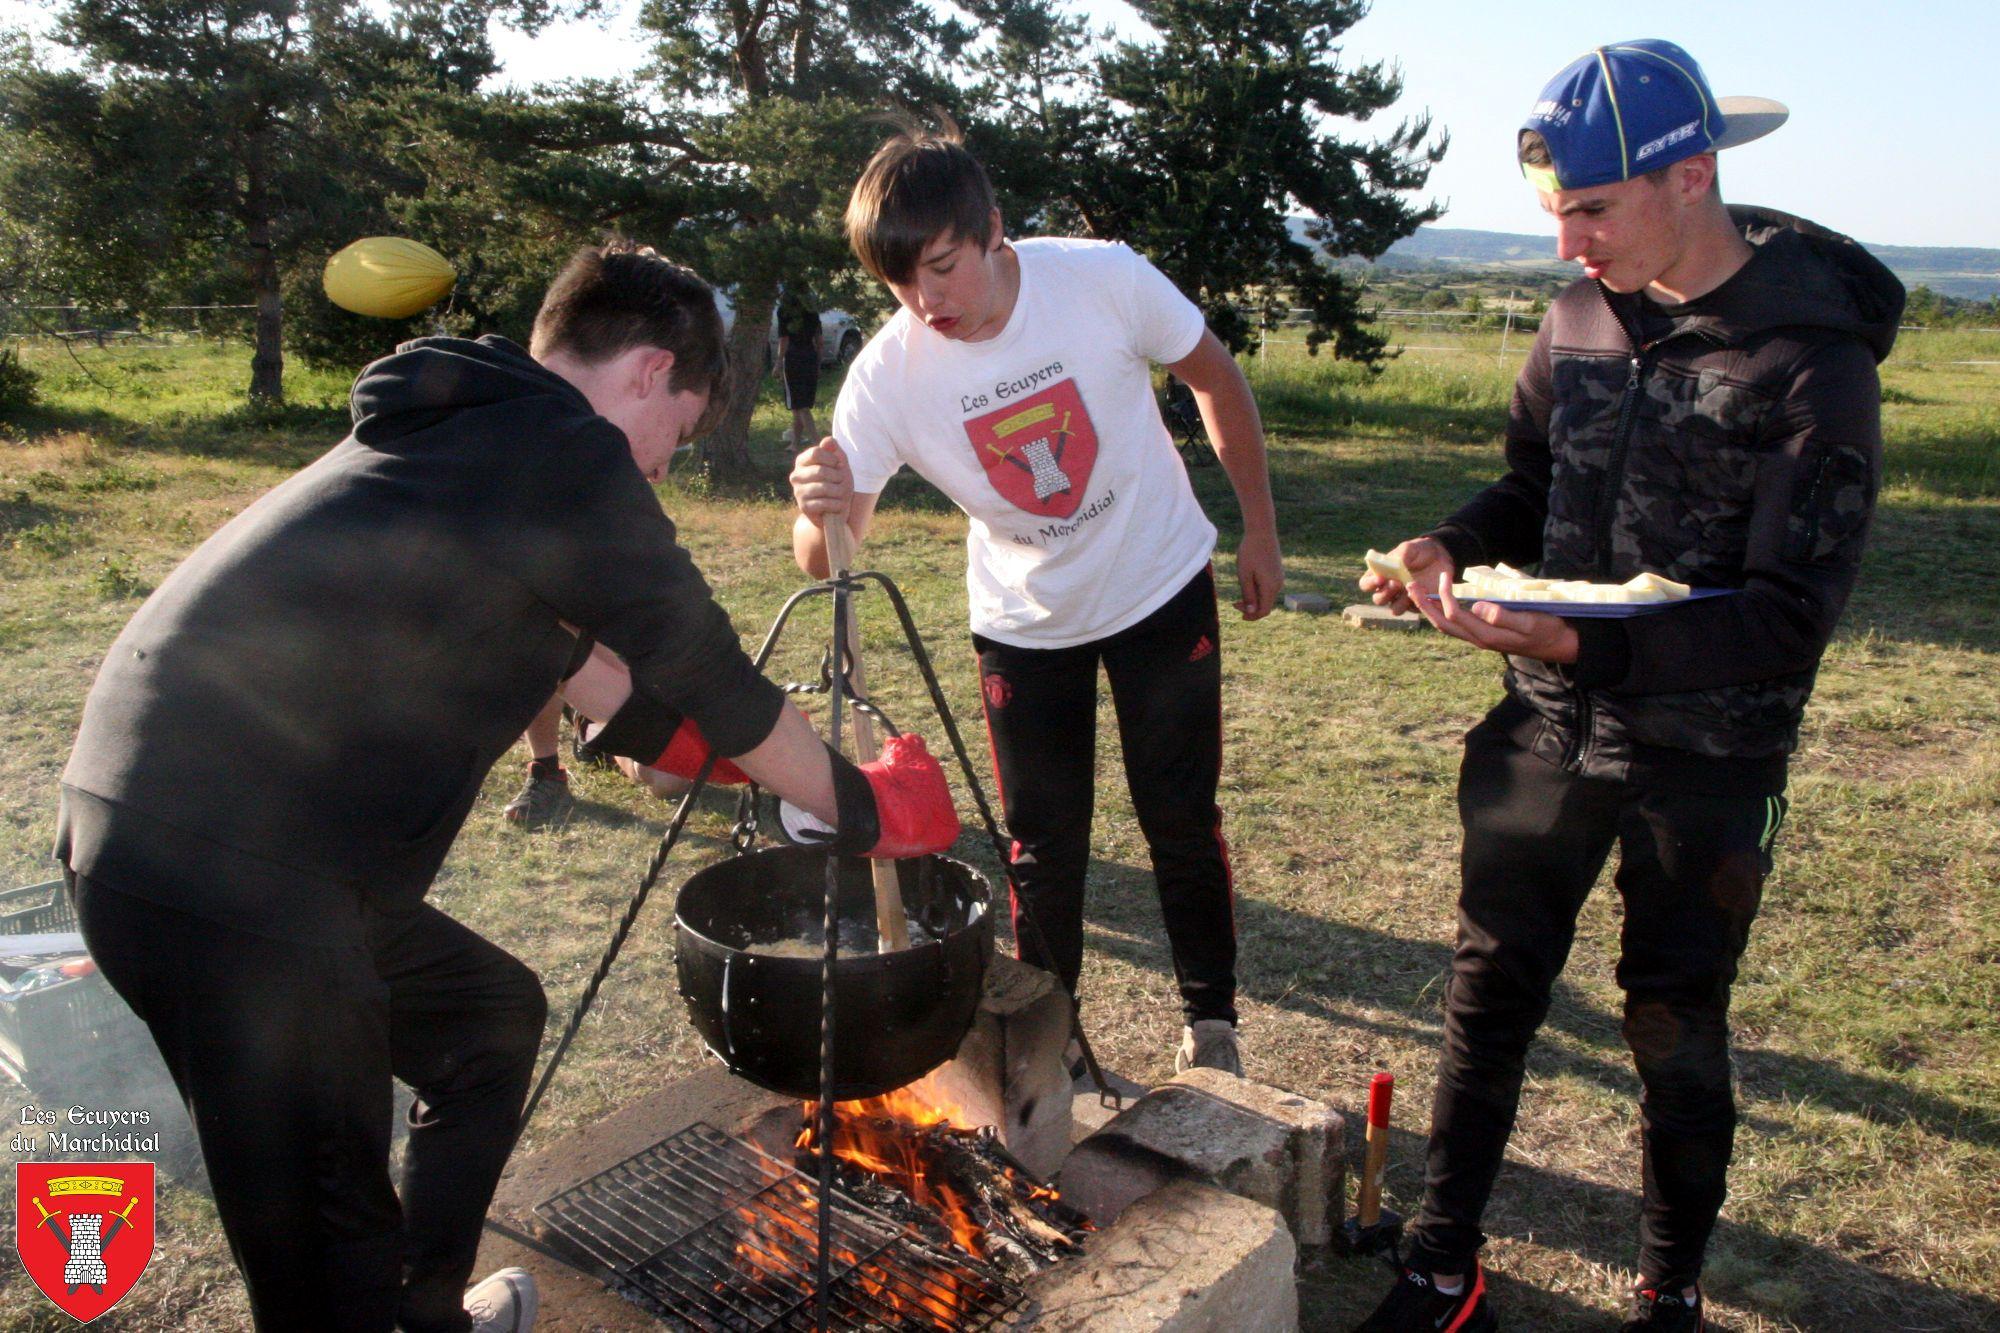 2020-06-01_Camping_Gourdon-23-www.marchidial.fr_